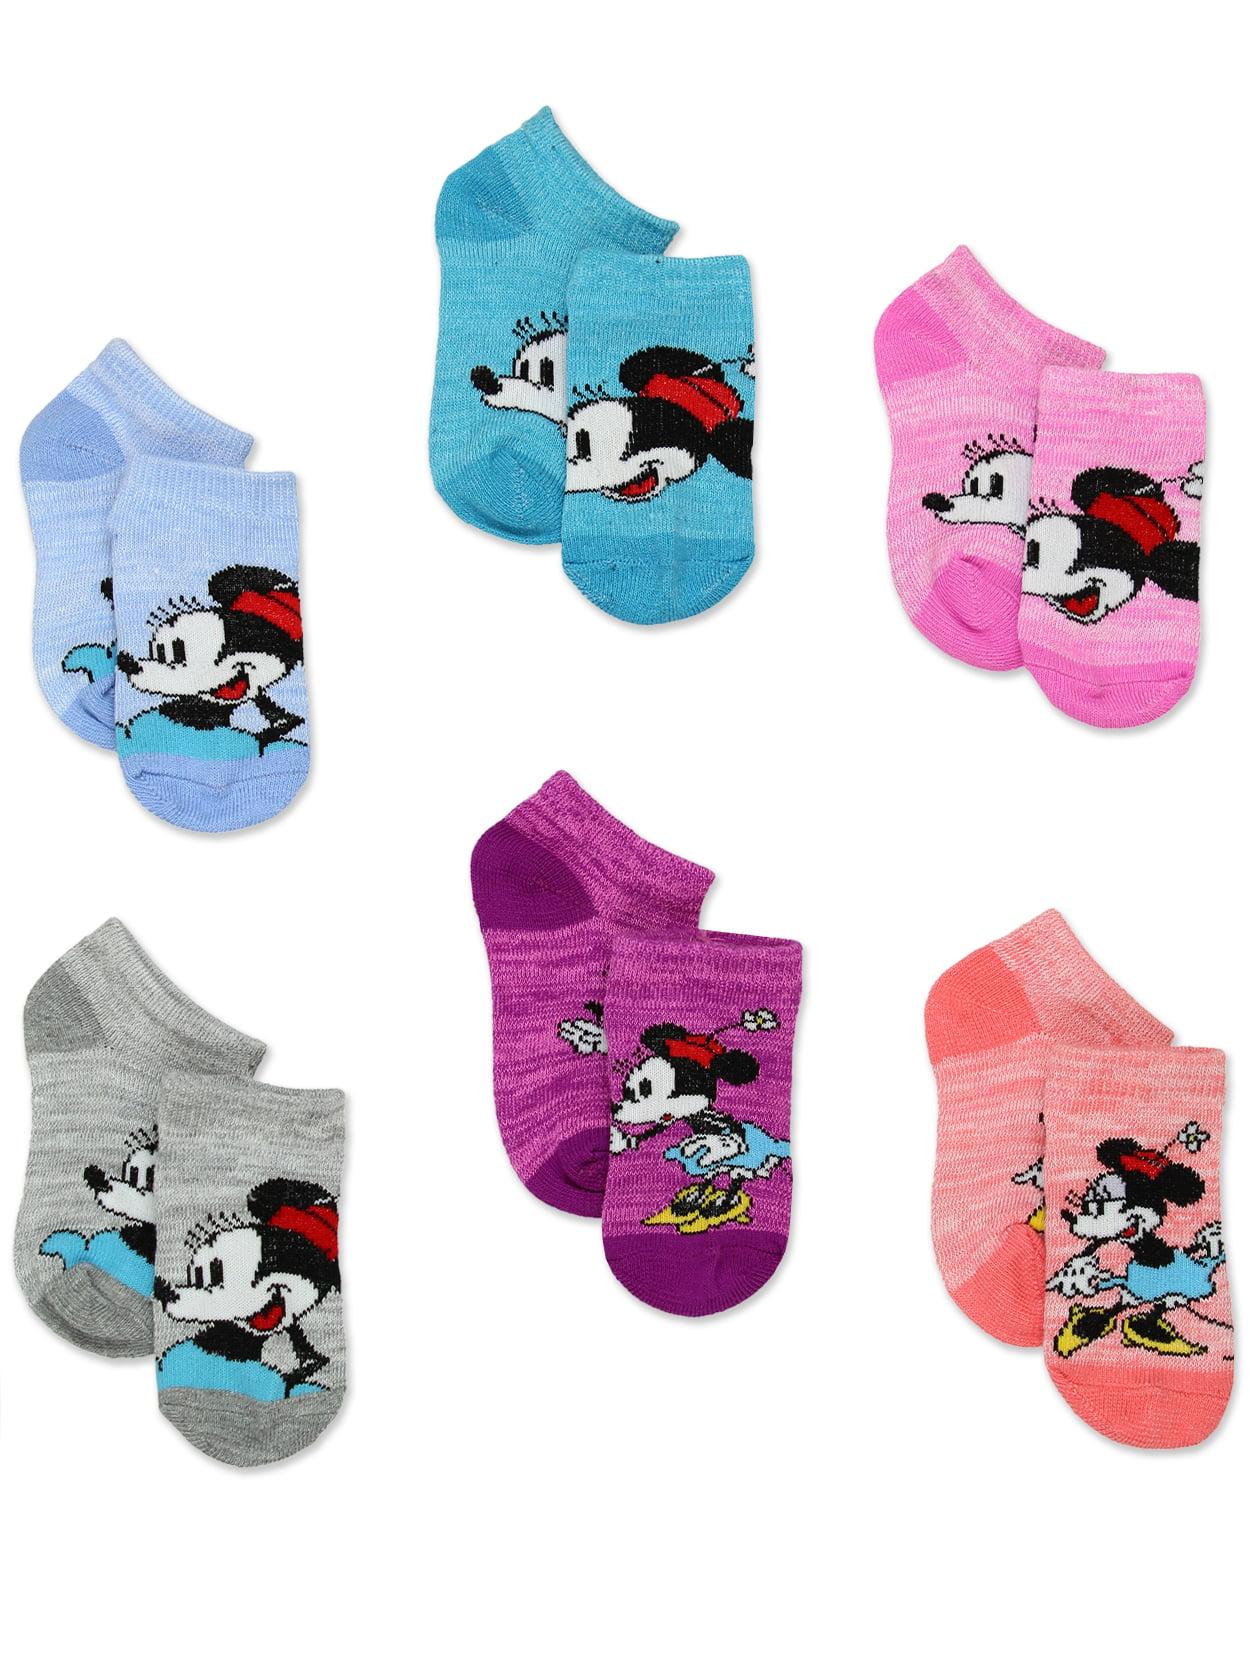 Low-Cut Socks Disney Minnie Mouse Toddler Girls 6 pk Size 2T-4T